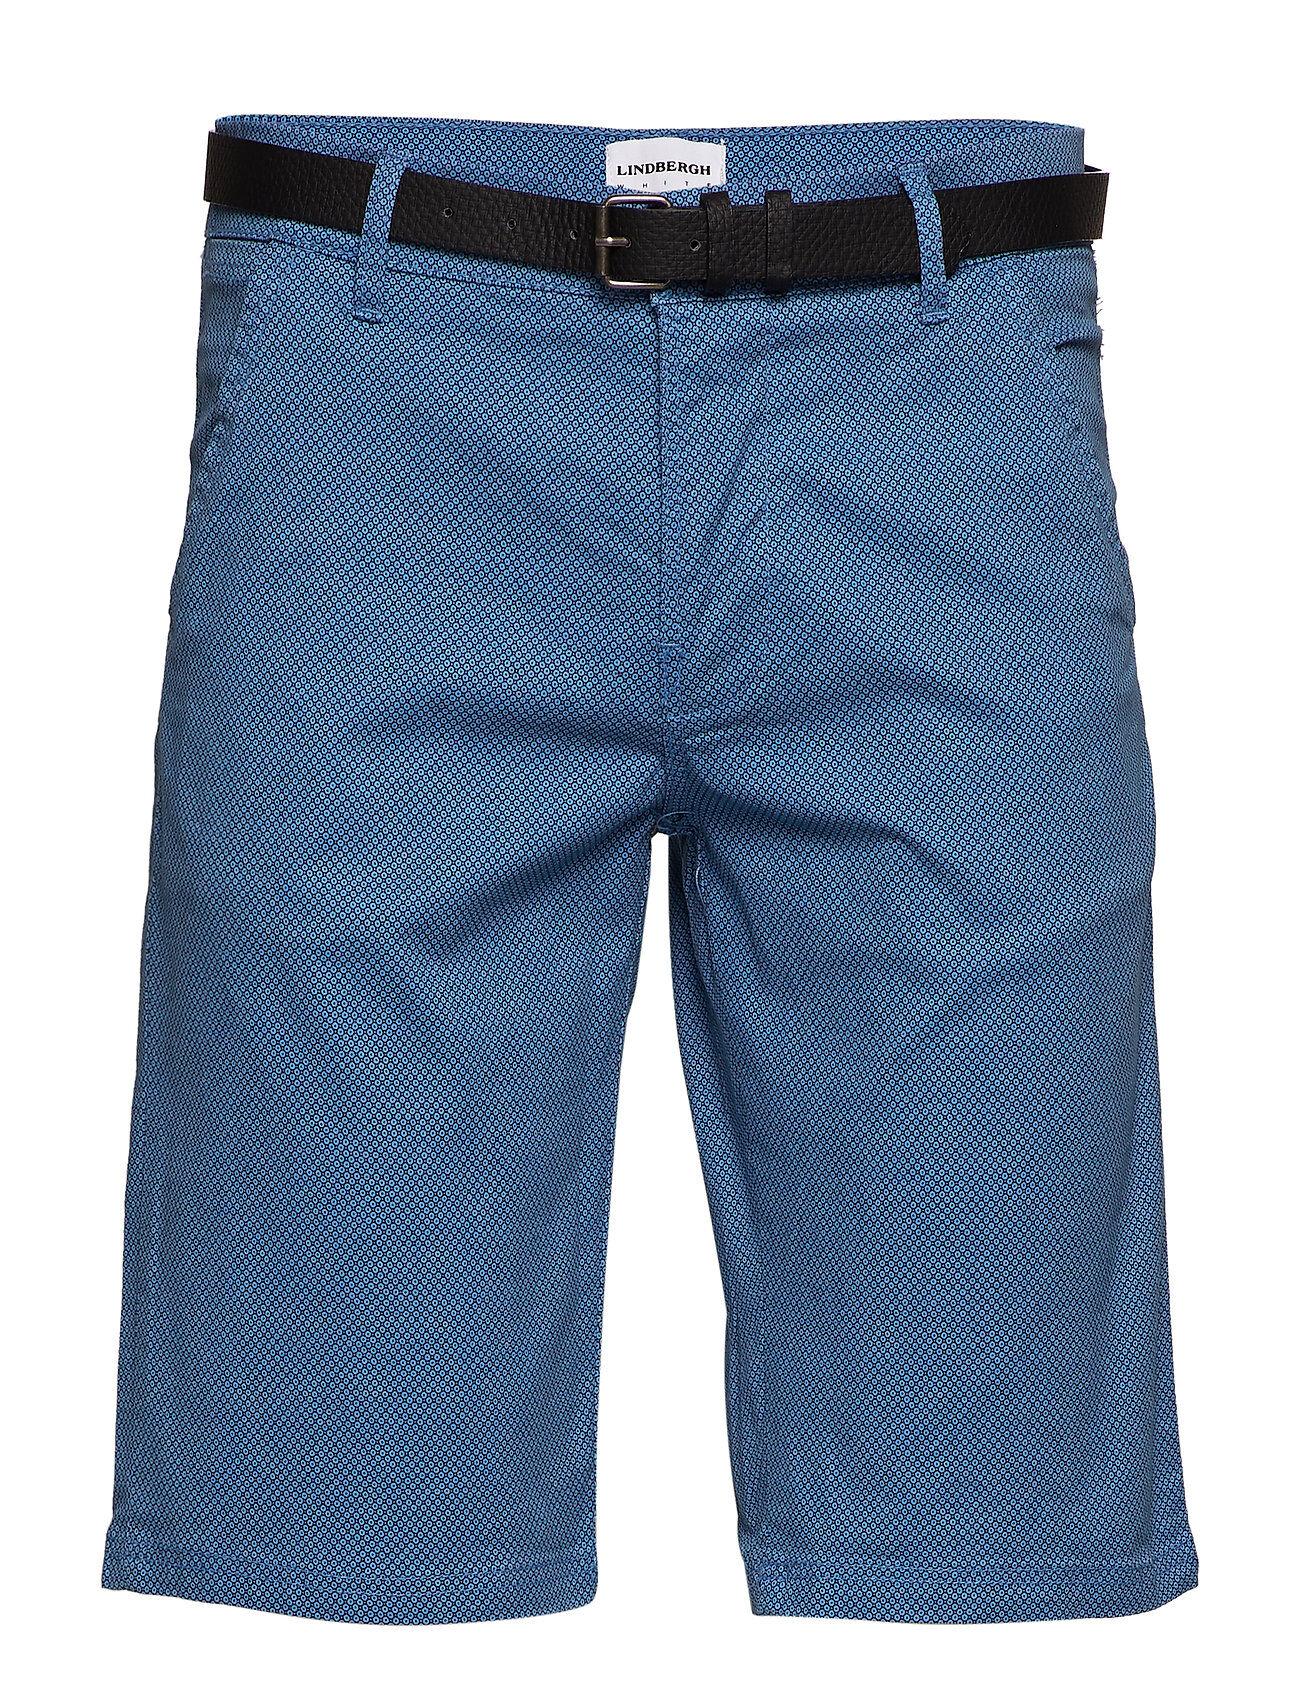 Lindbergh Aop Chino Shorts W. Belt